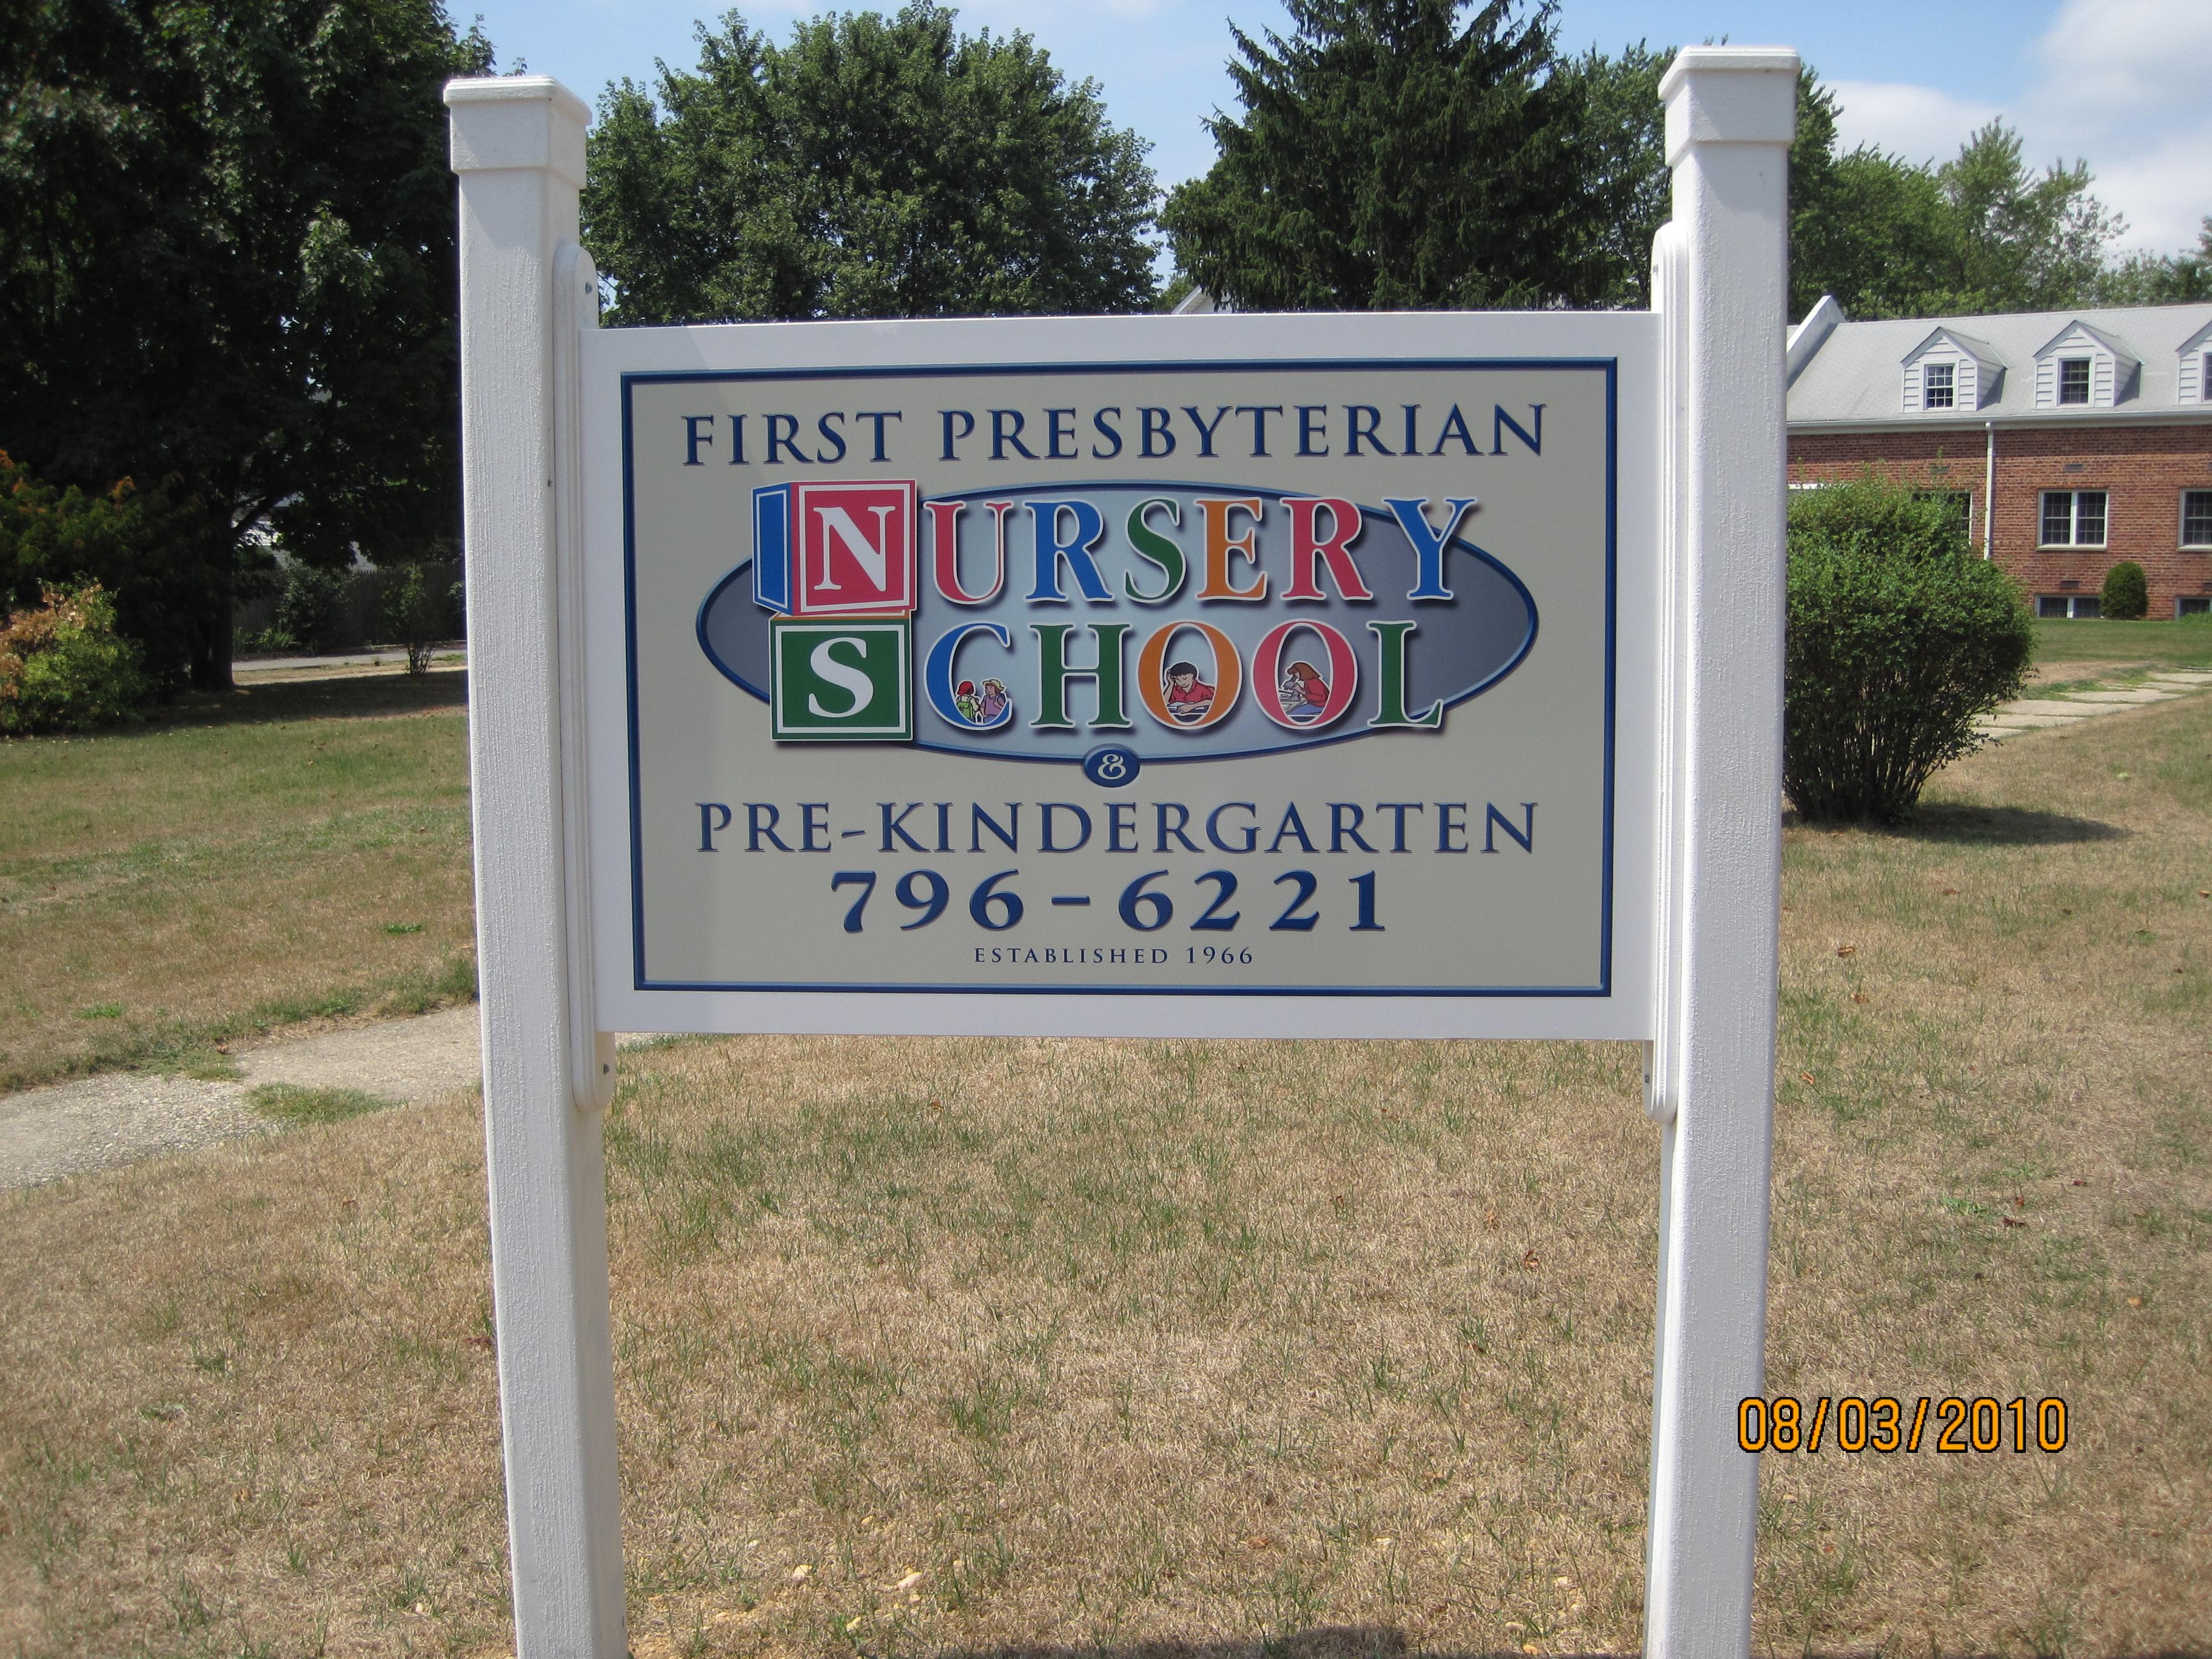 FIRST PRESBYTERIAN CHURCH, LEVITTOWN, NY